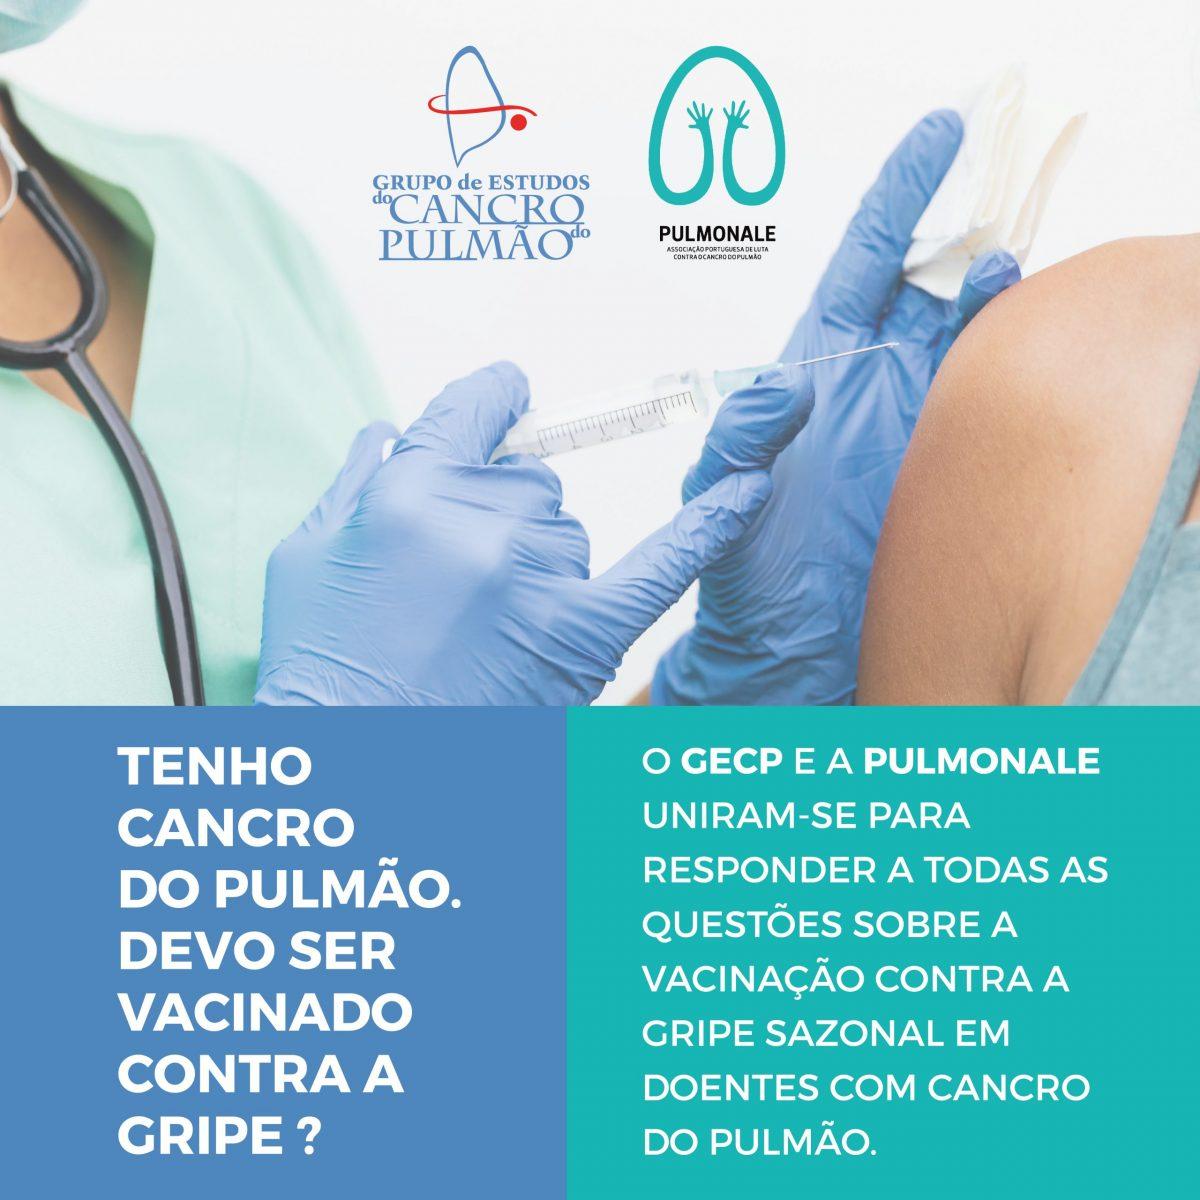 Pulmonale e GECP. Dúvidas sobre a Gripe